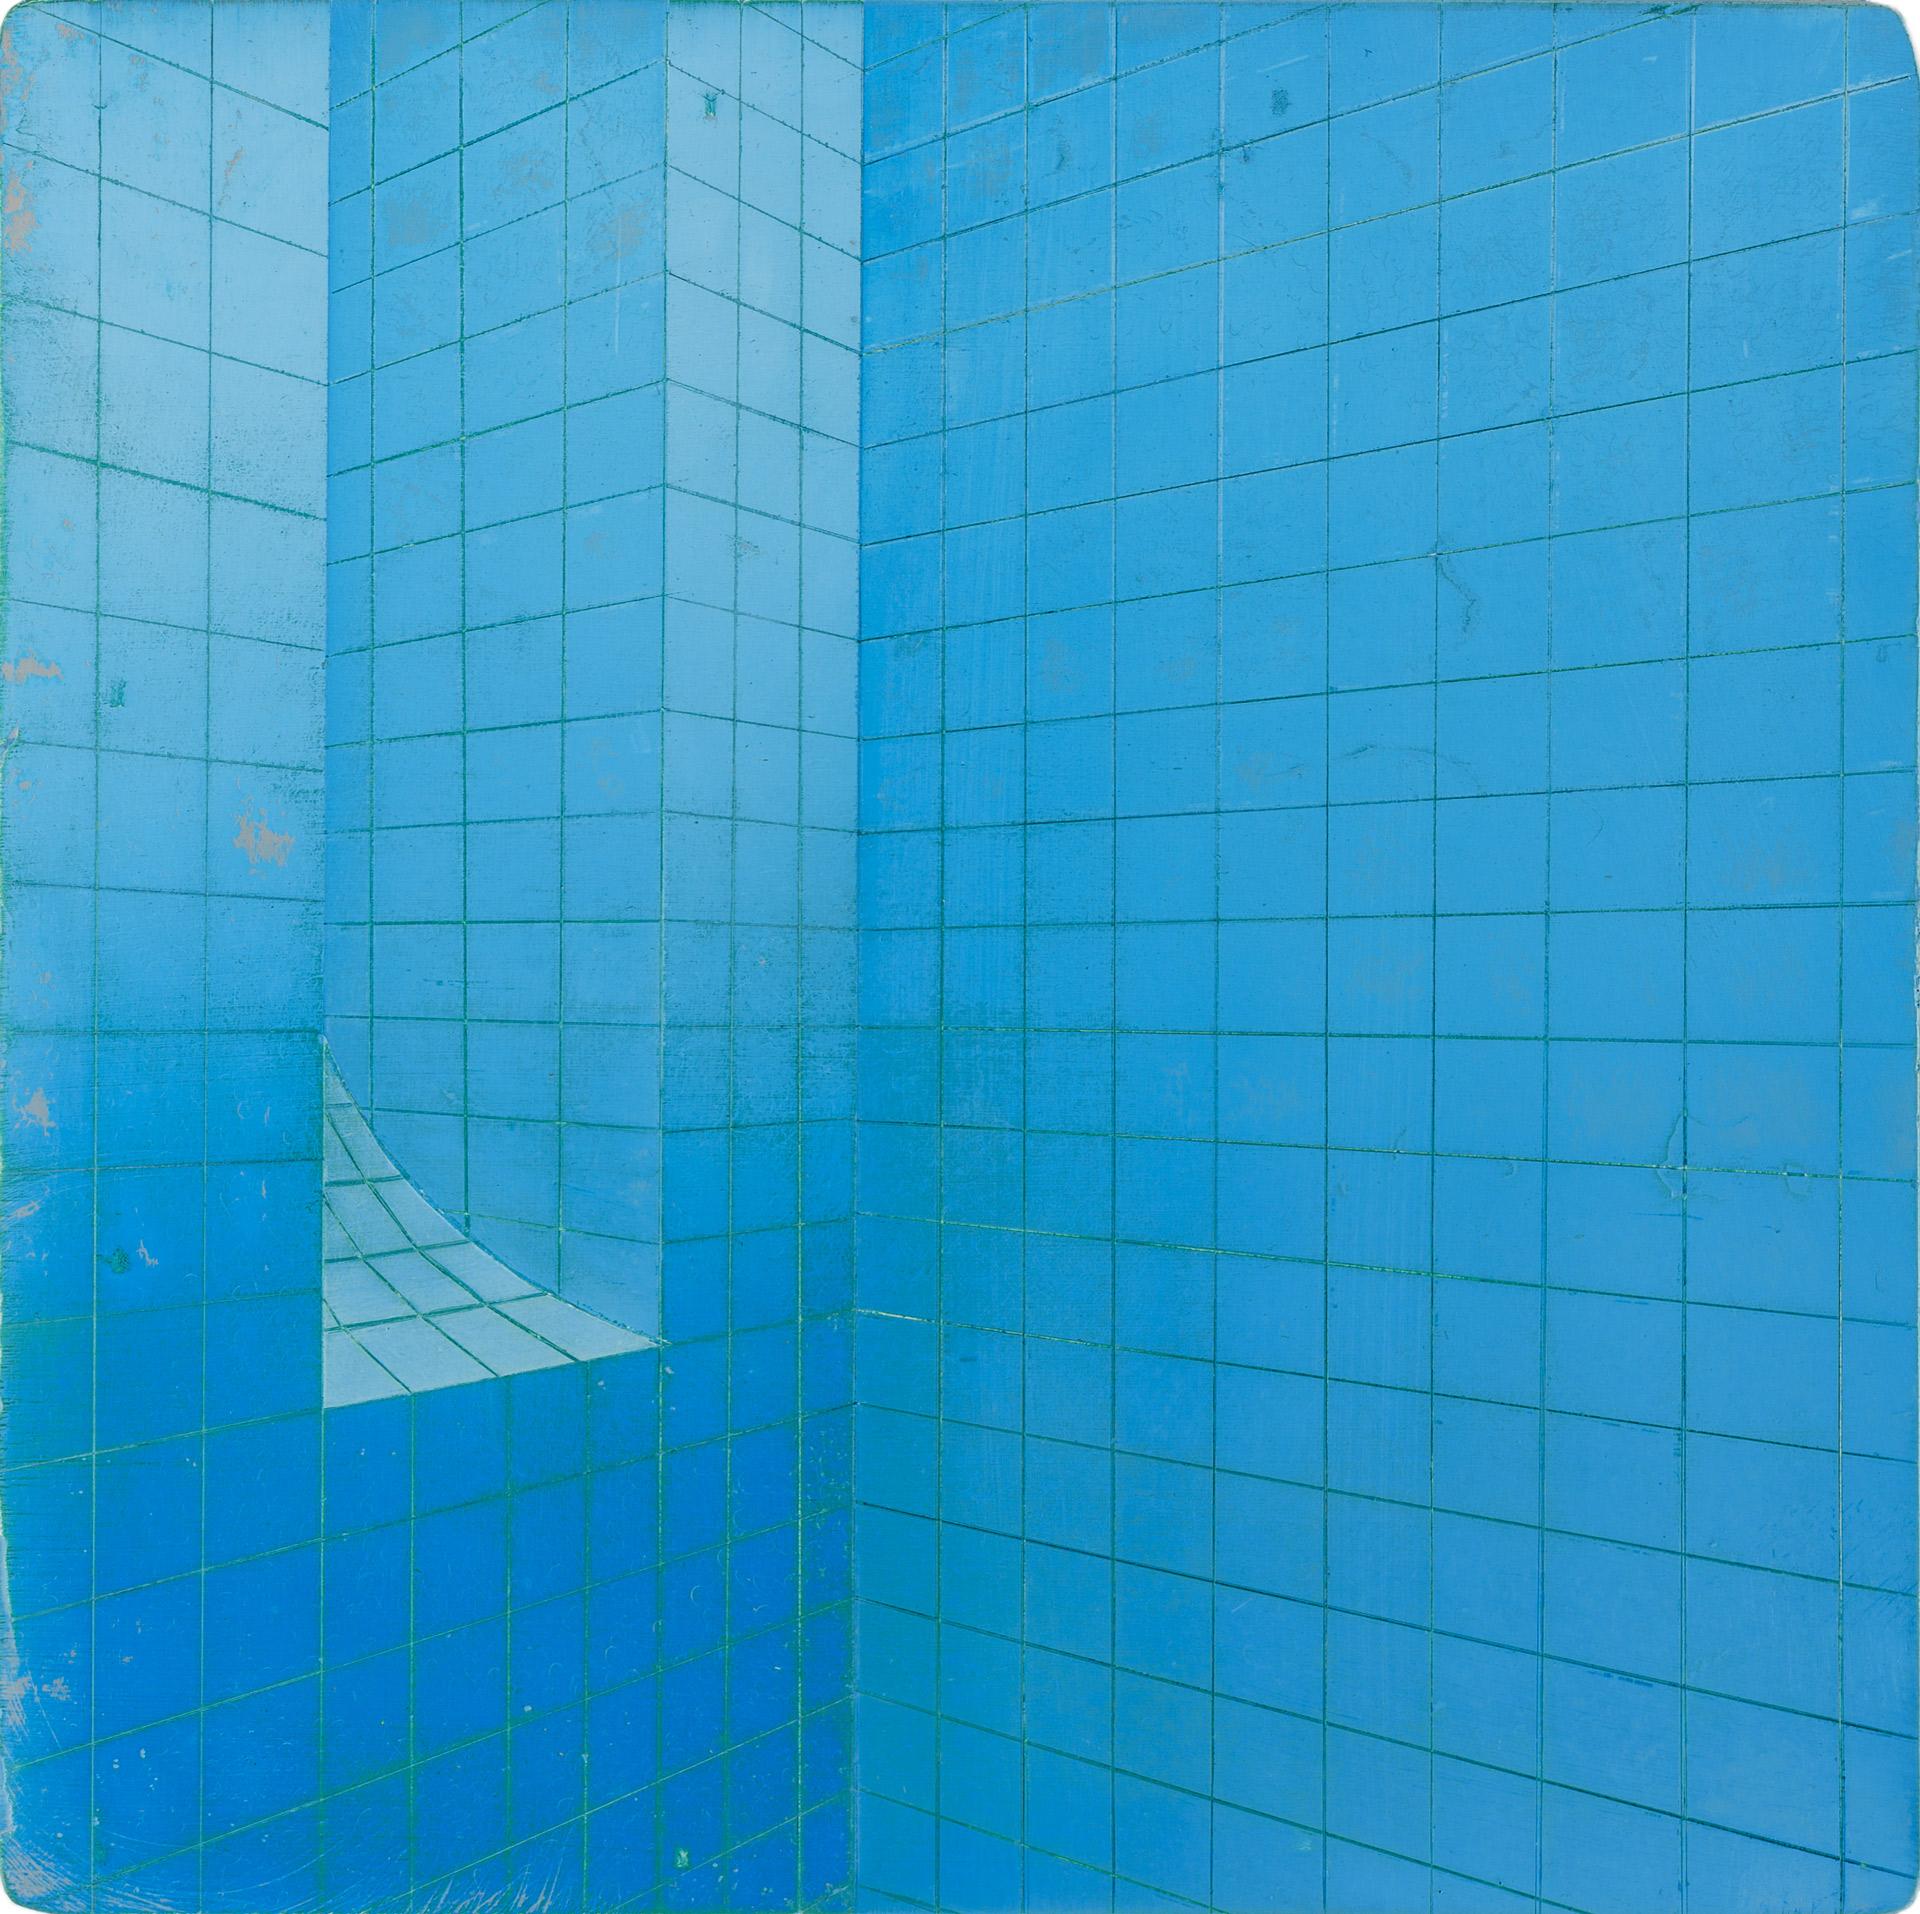 Untitled/20 x 20 cm, Oil on wood/2019